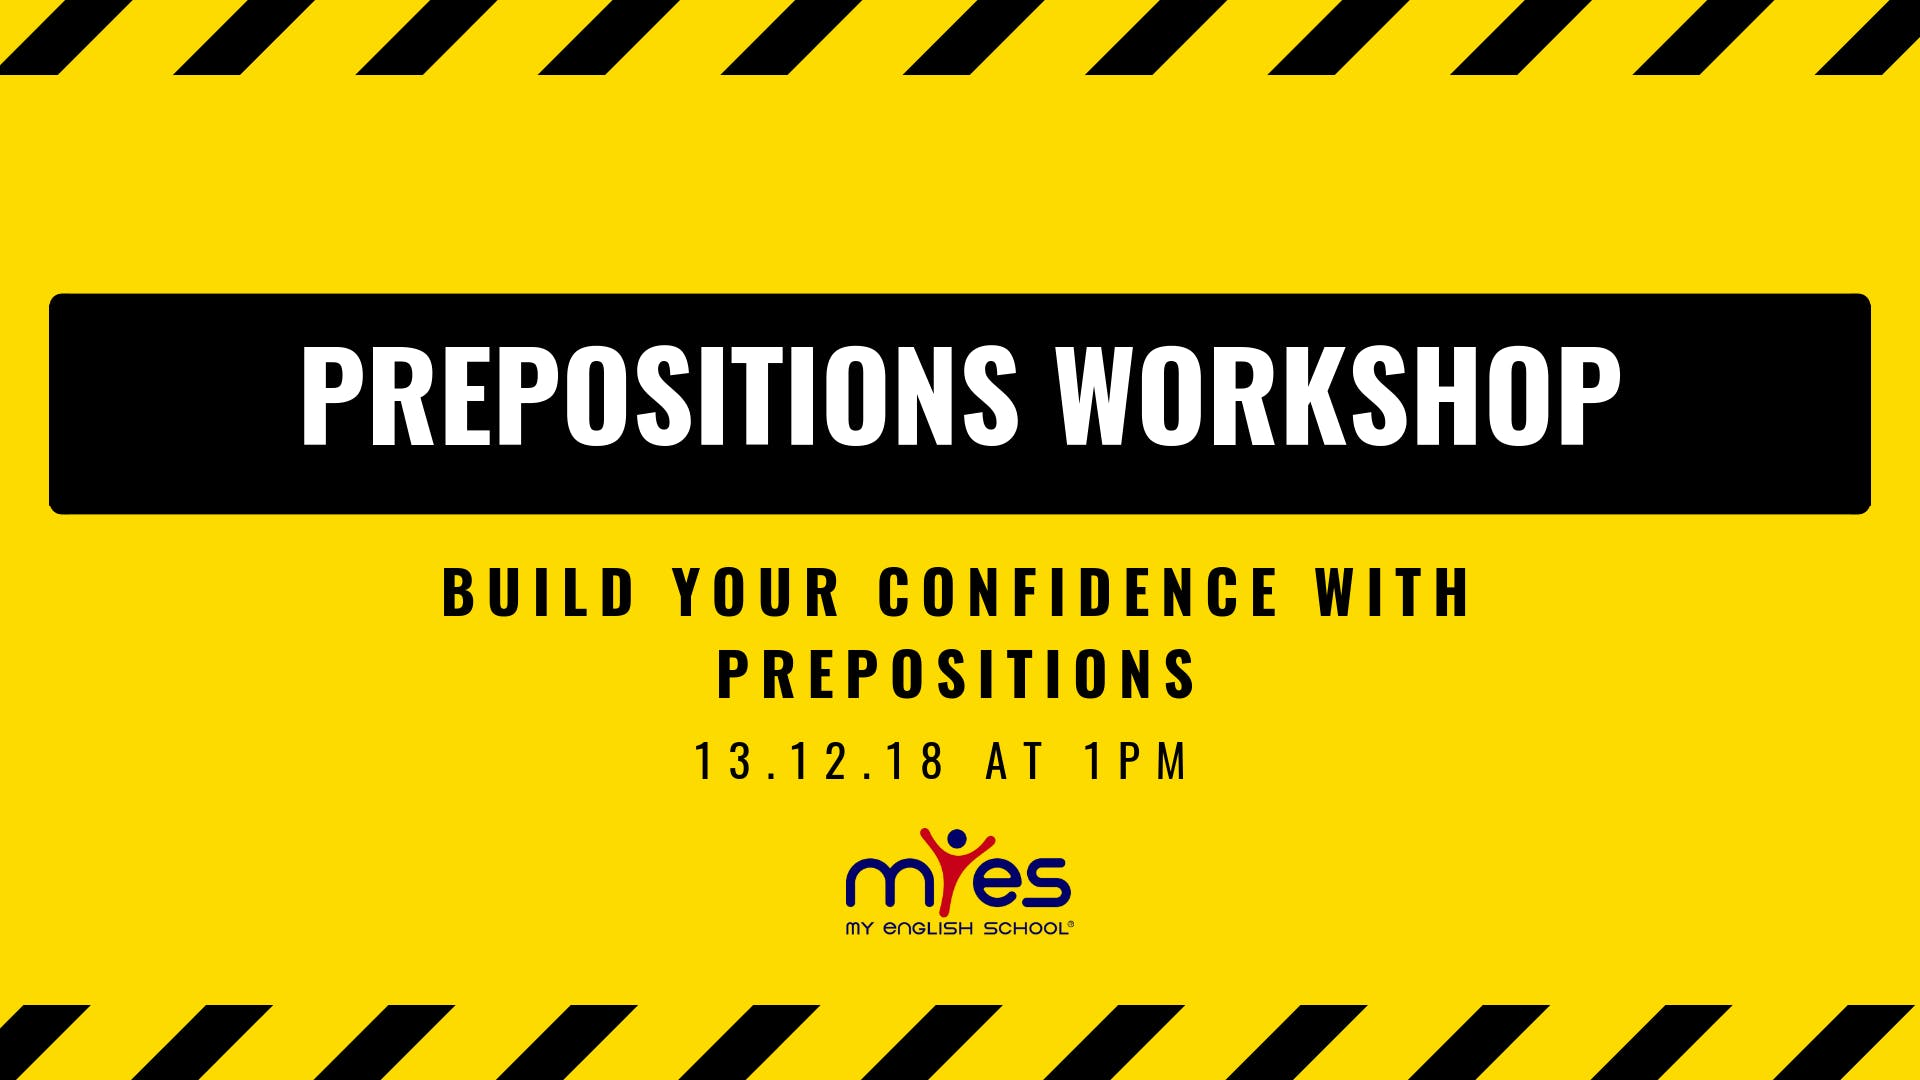 Prepositions' Workshop